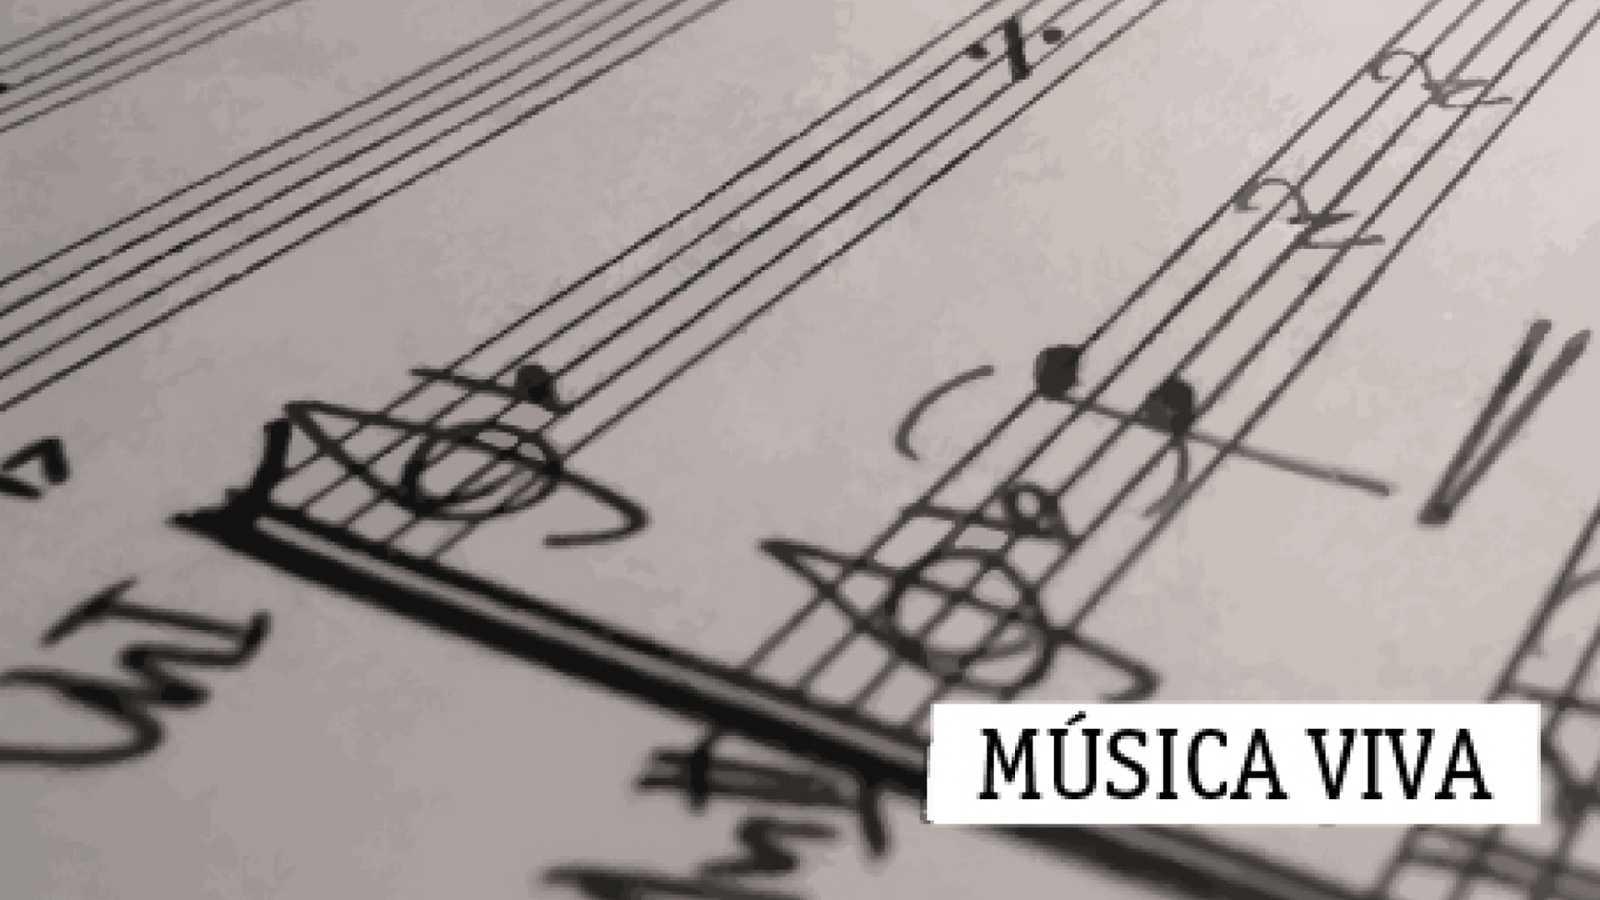 Música viva - Charlamos con Belenish Moreno Gil y con Óscar Escudero - 17/05/20 - escuchar ahora